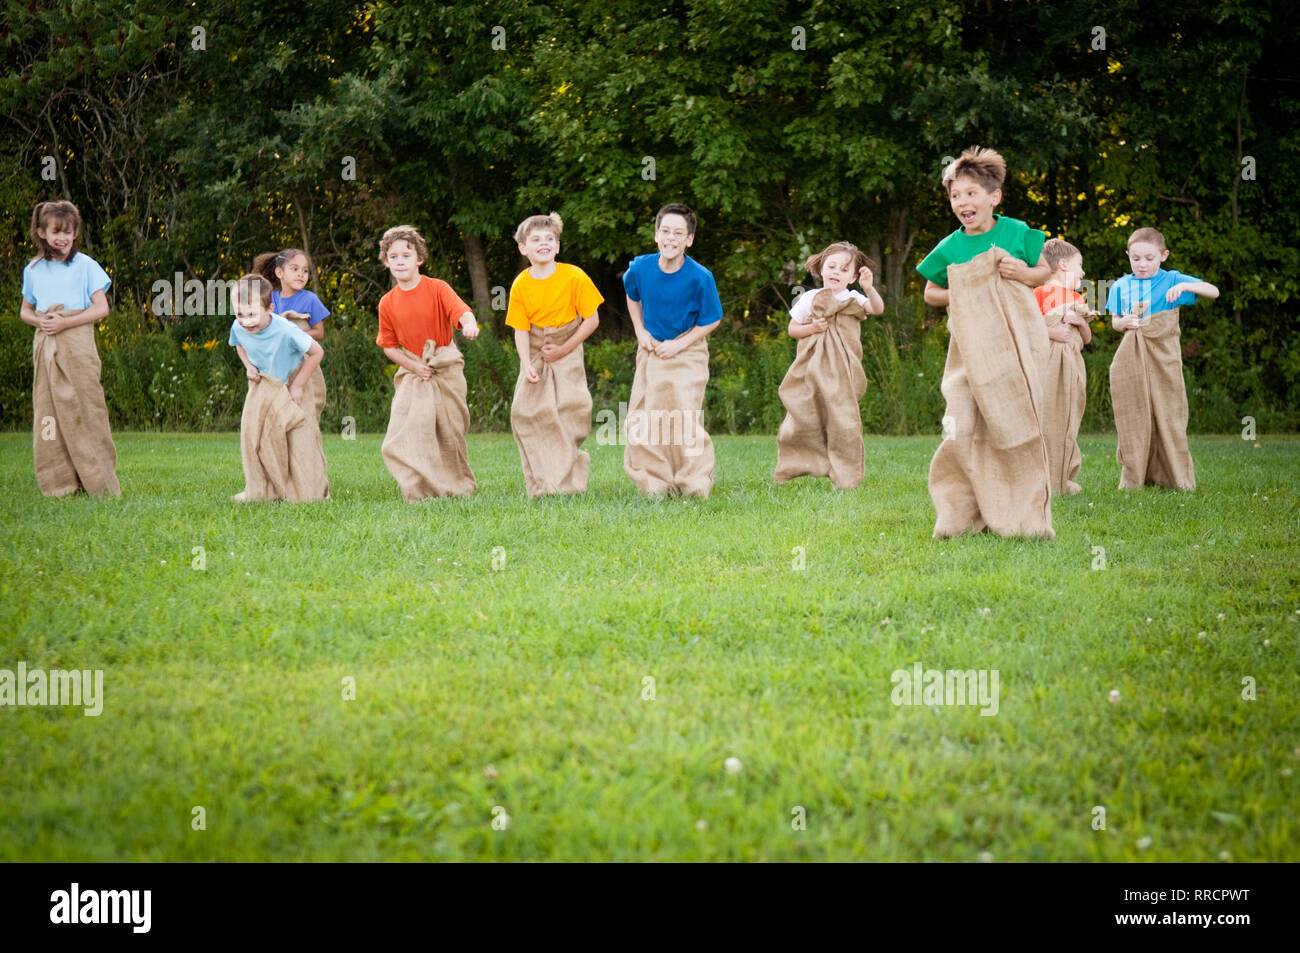 Happy Kids Having Potato Sack Race Outside - Stock Image